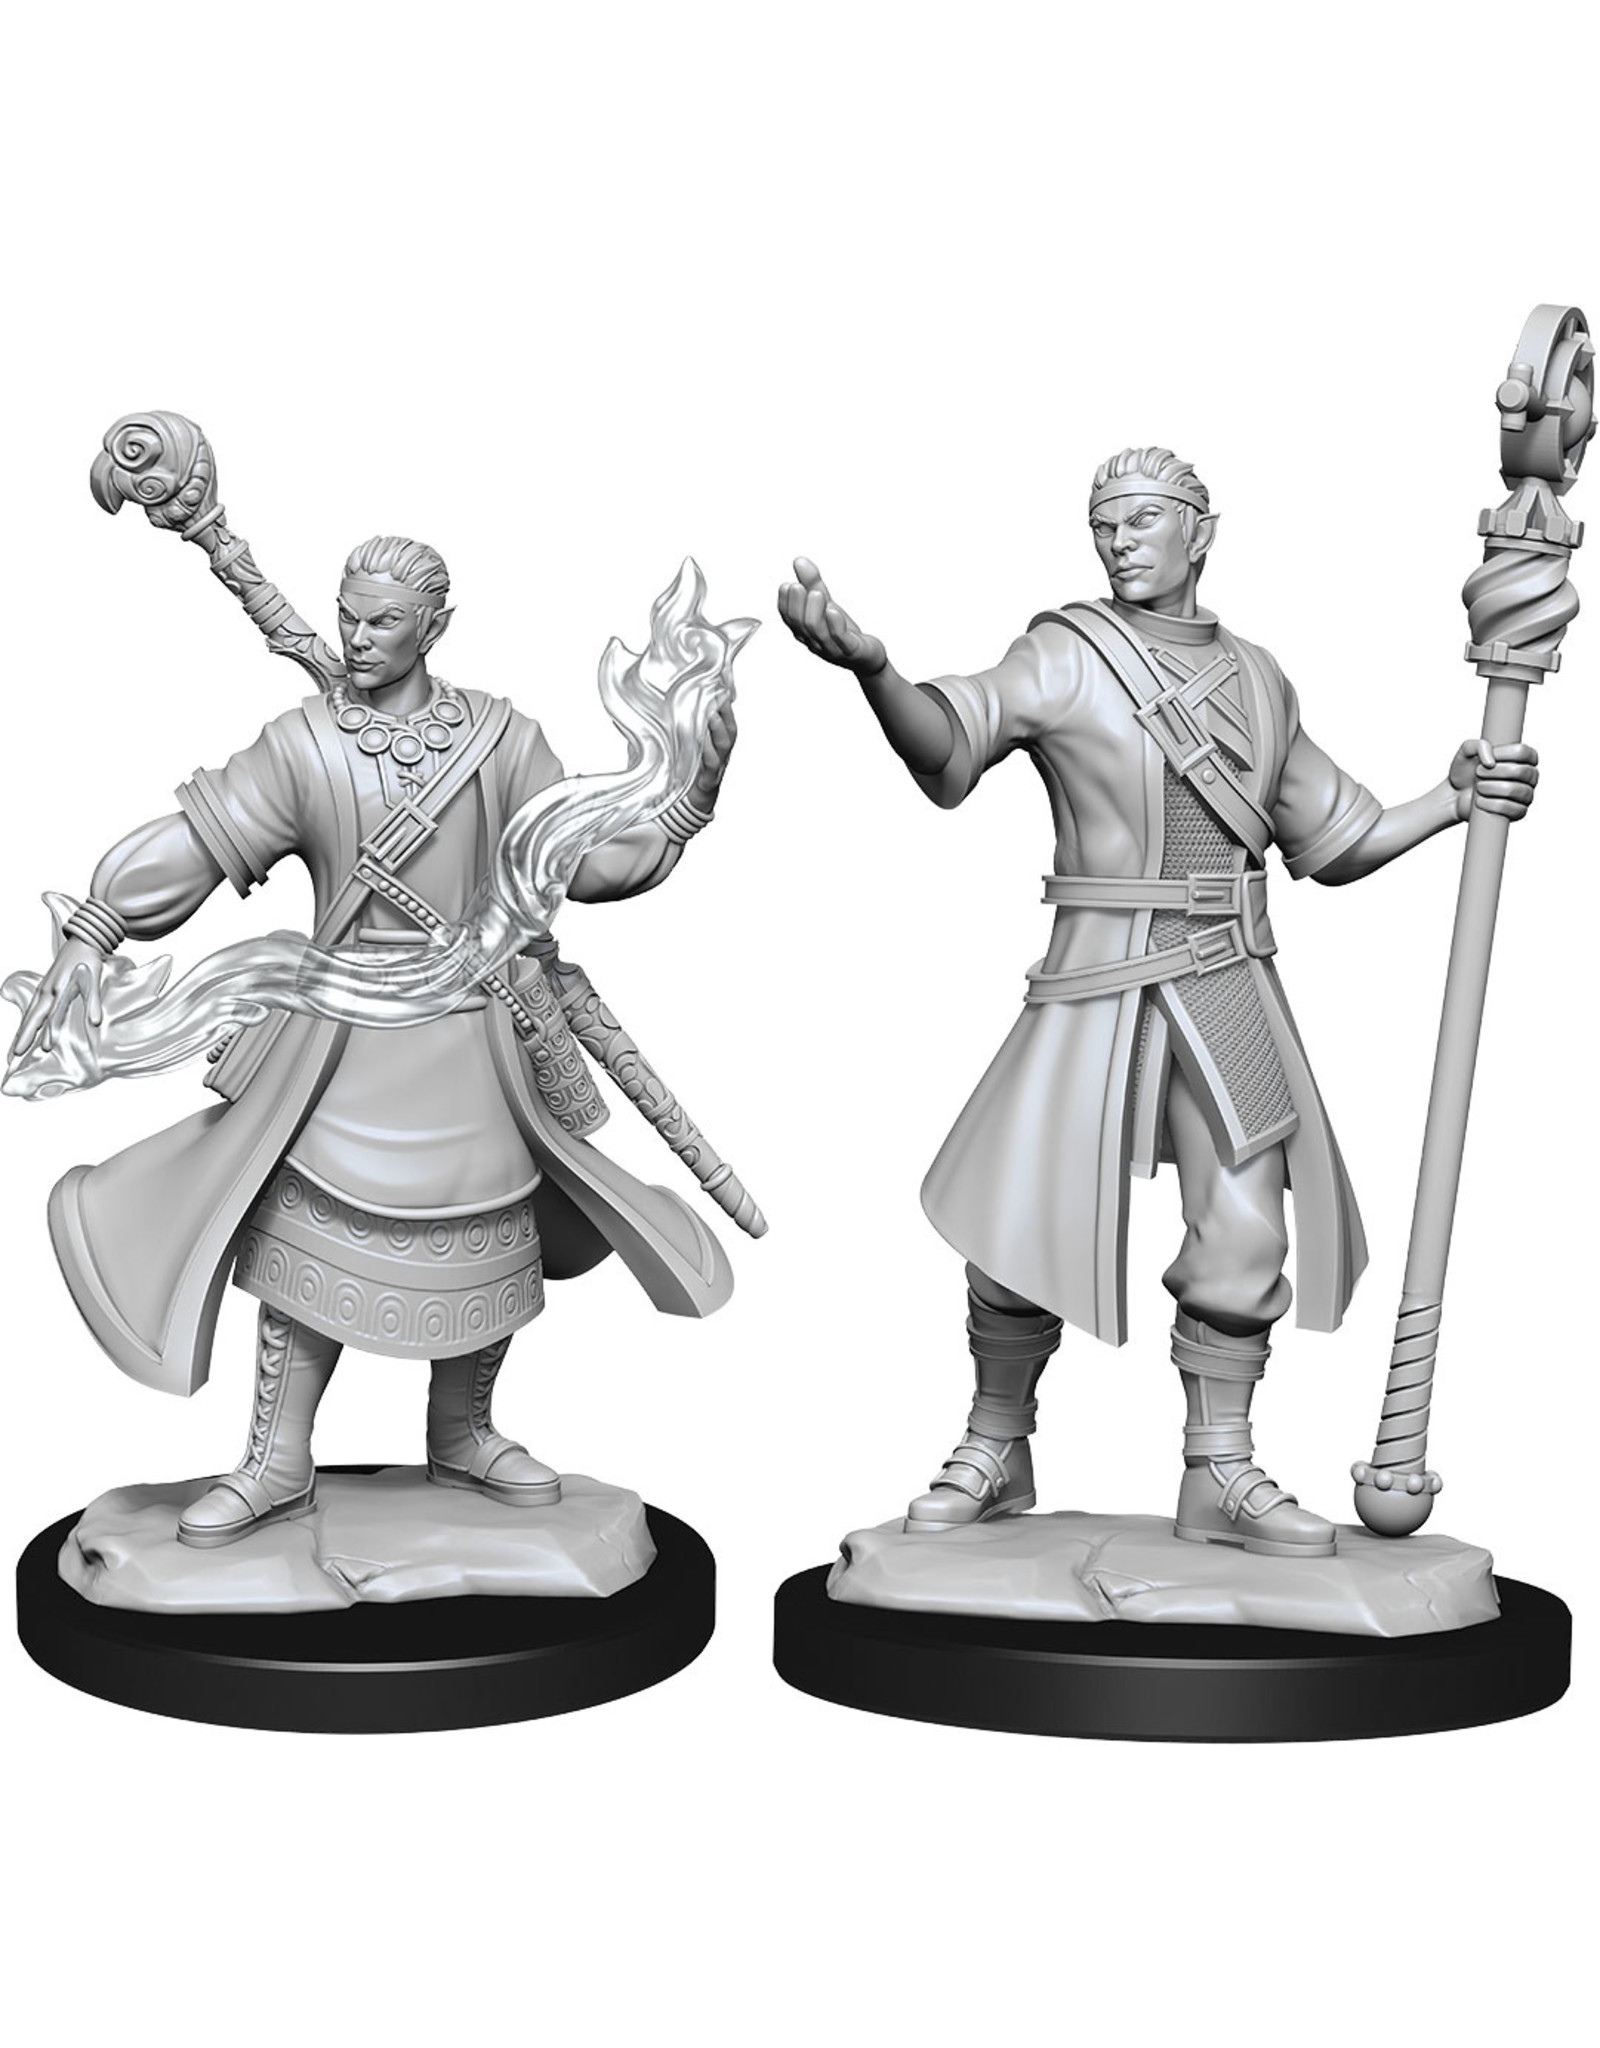 Wizkids D&D Nolzurs Unpainted Minis: W14 Half-Elf Wizard Male